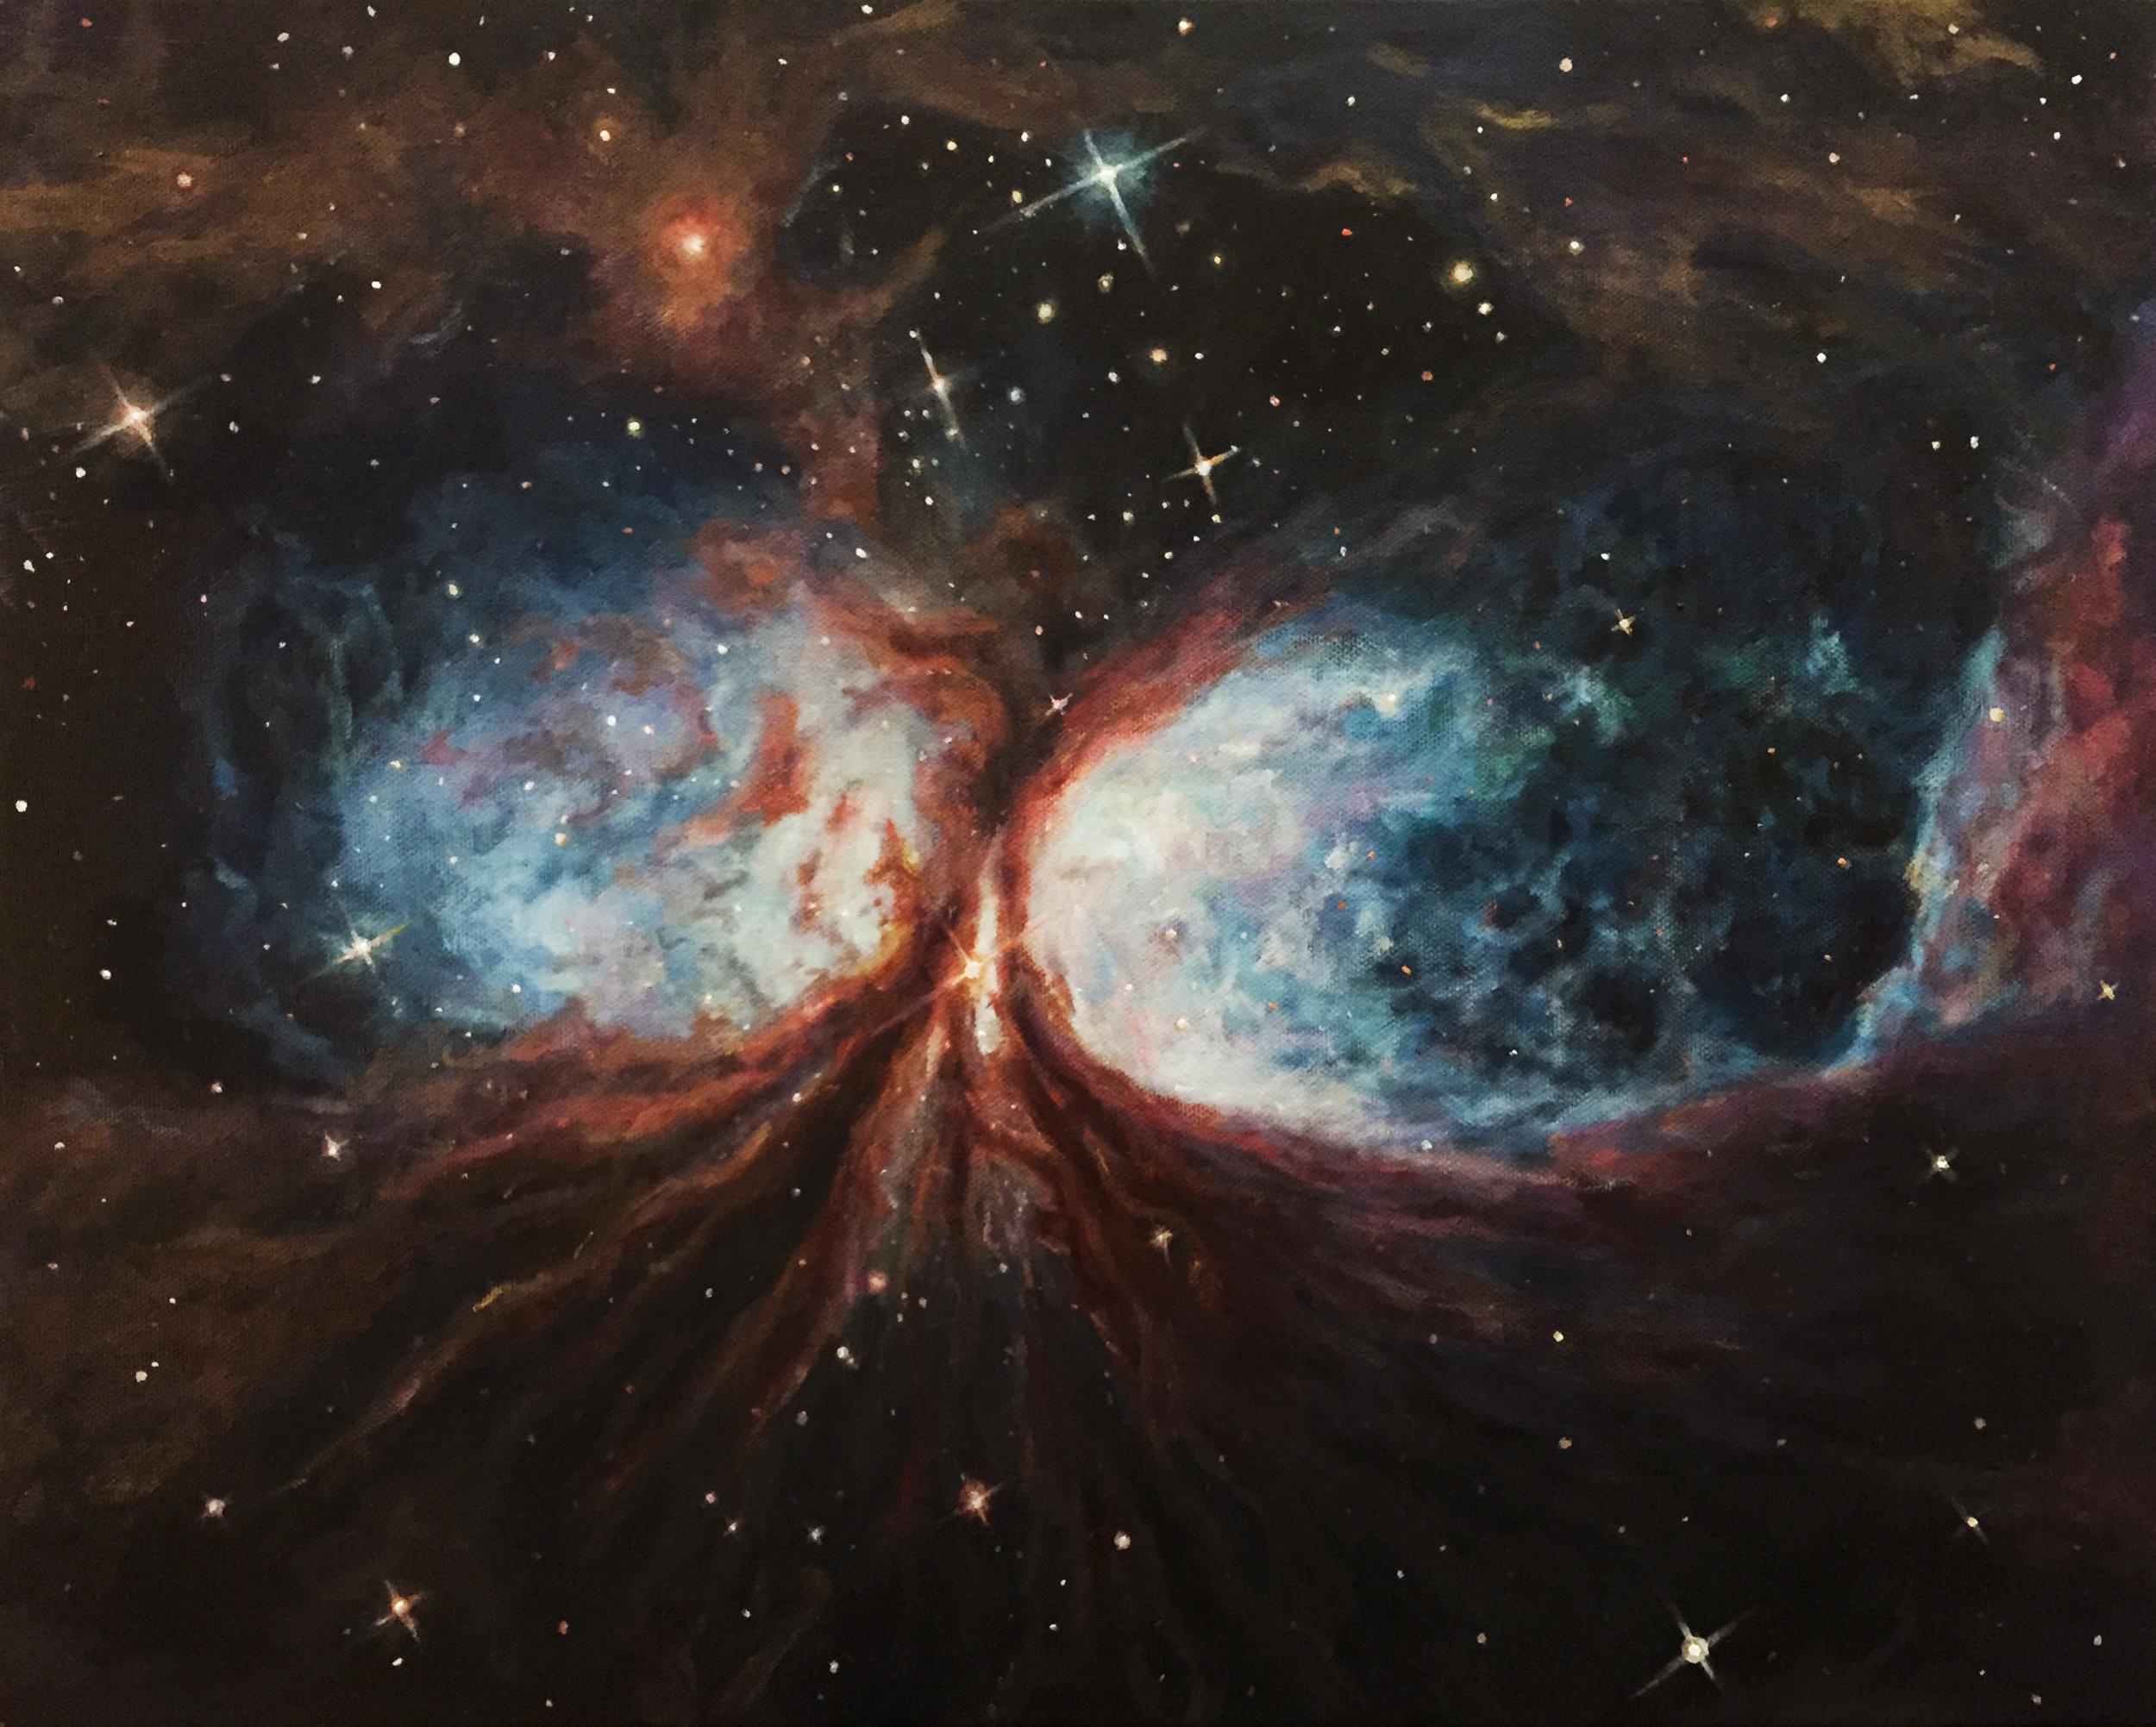 Star Forming Region s106_Painting_Christie Snelson.jpg